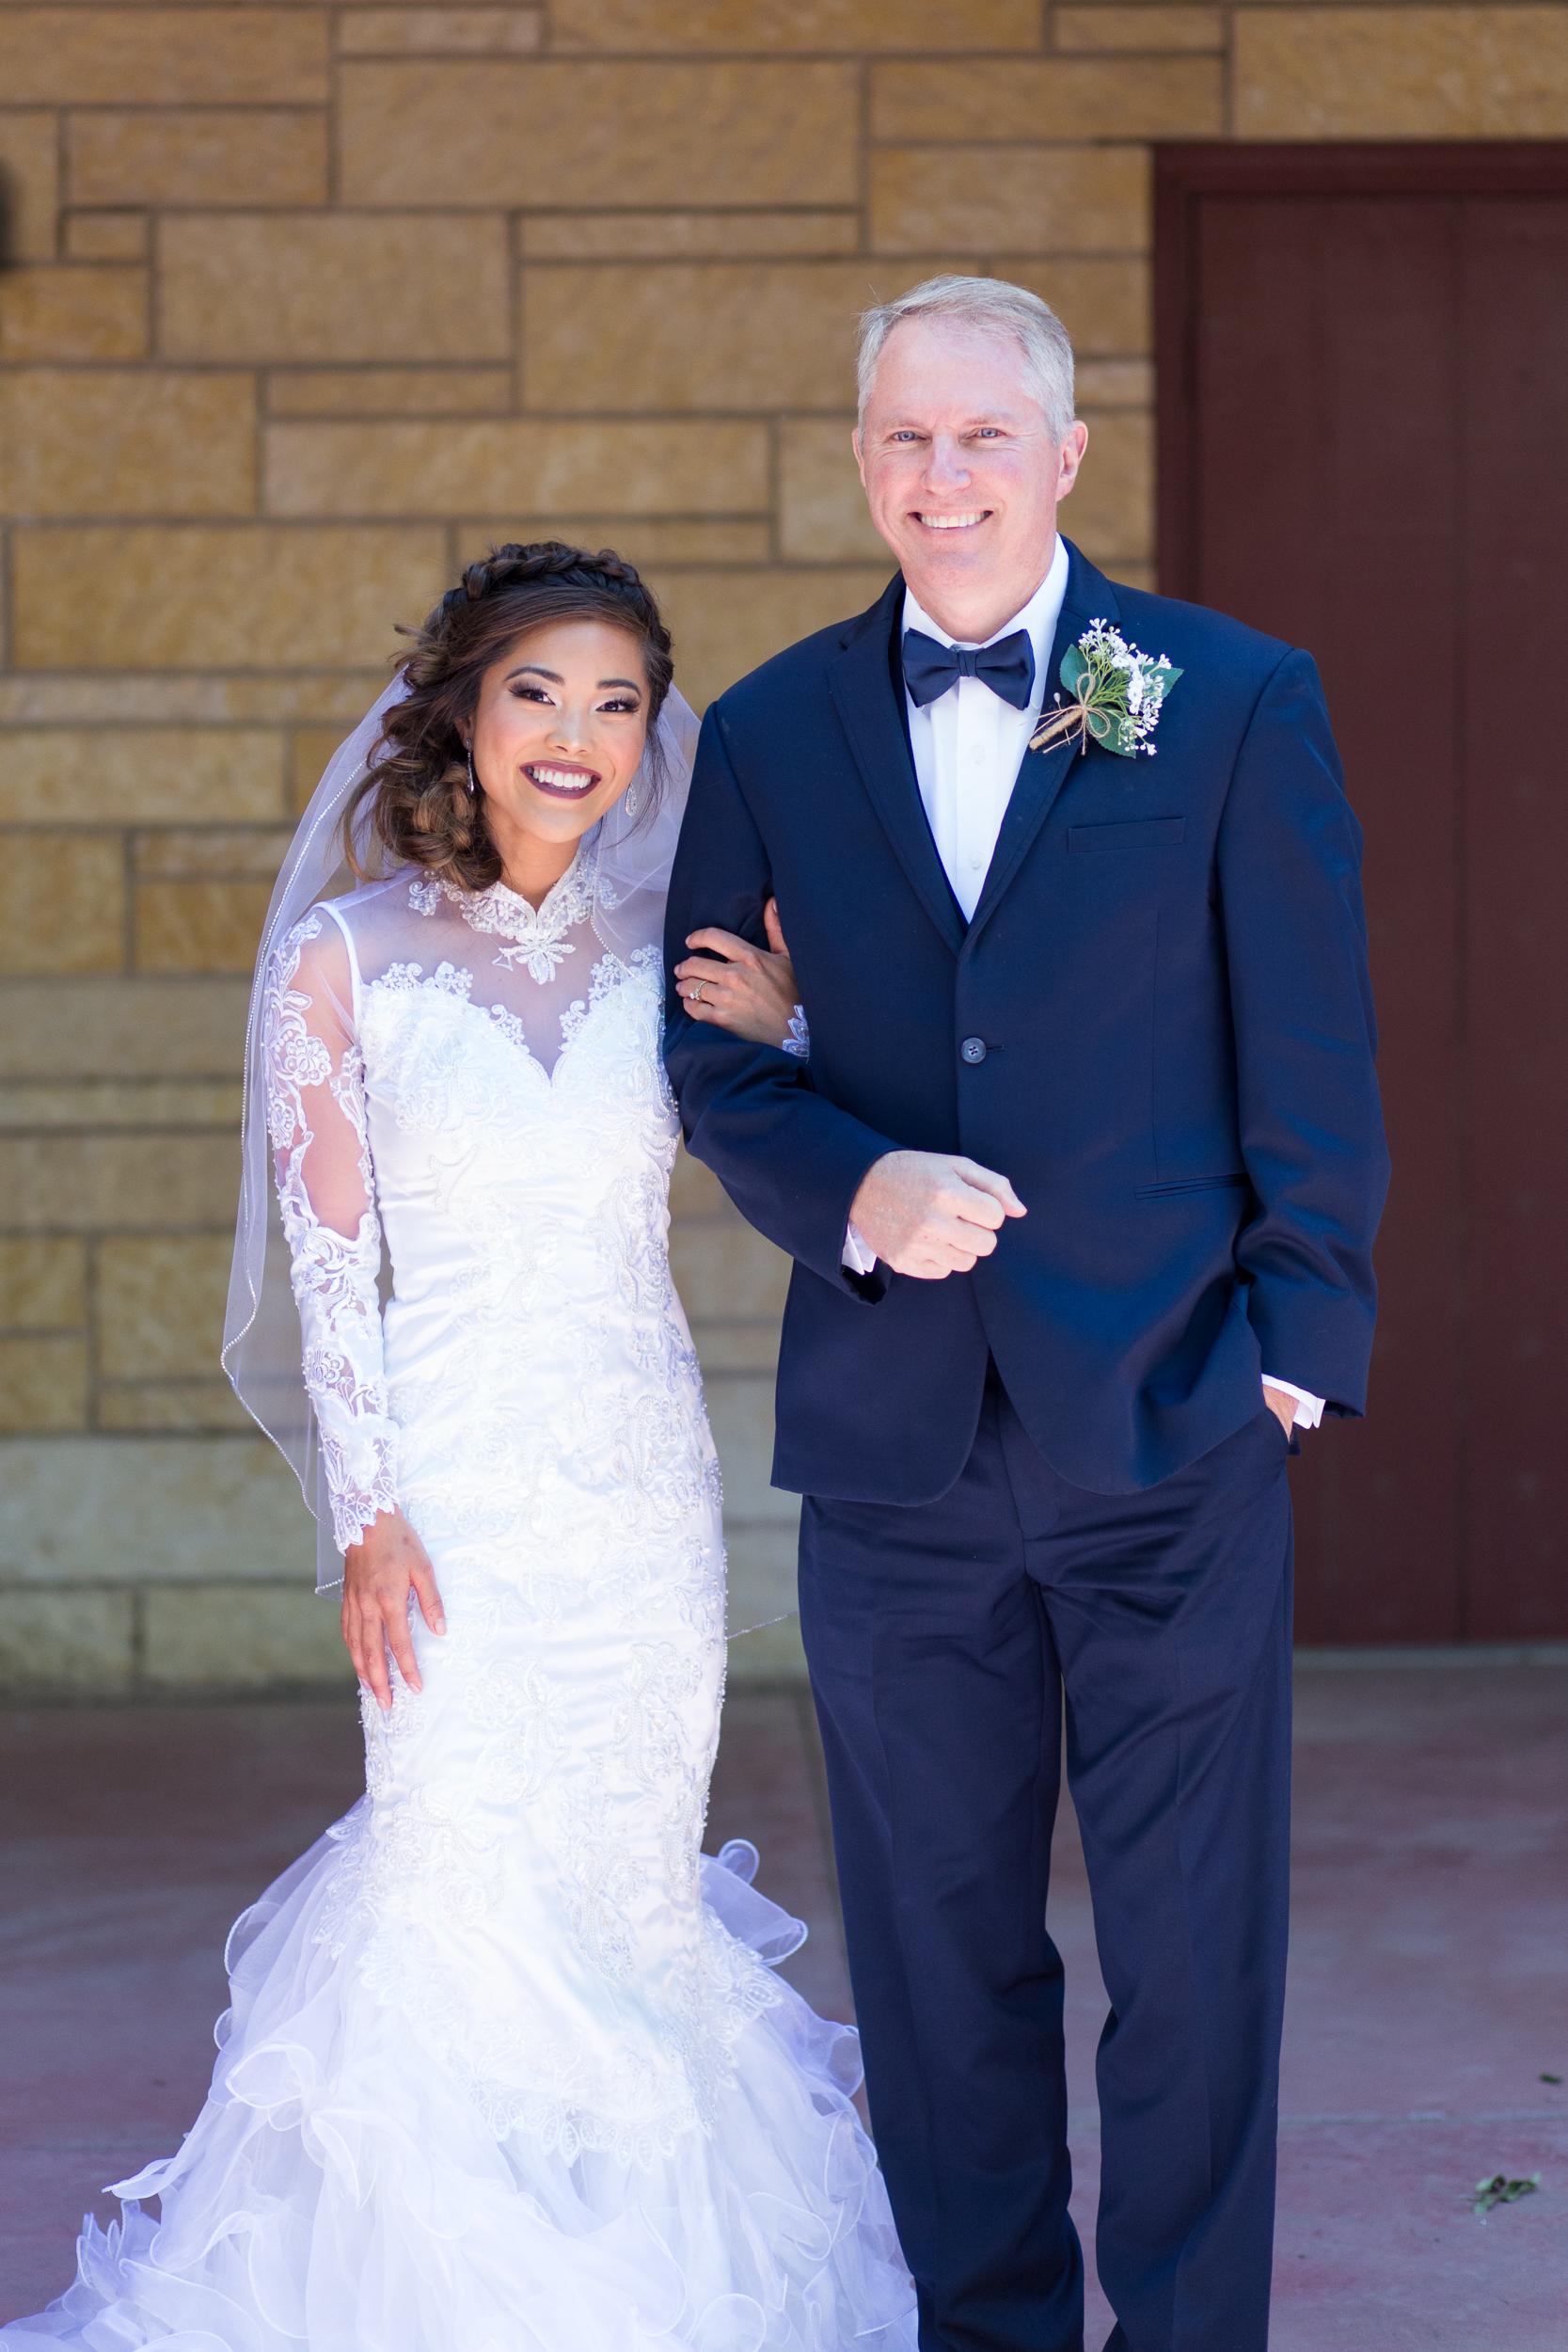 hall_wedding blog_kelsie hendricks photography_odessa_ west texas-37.jpg